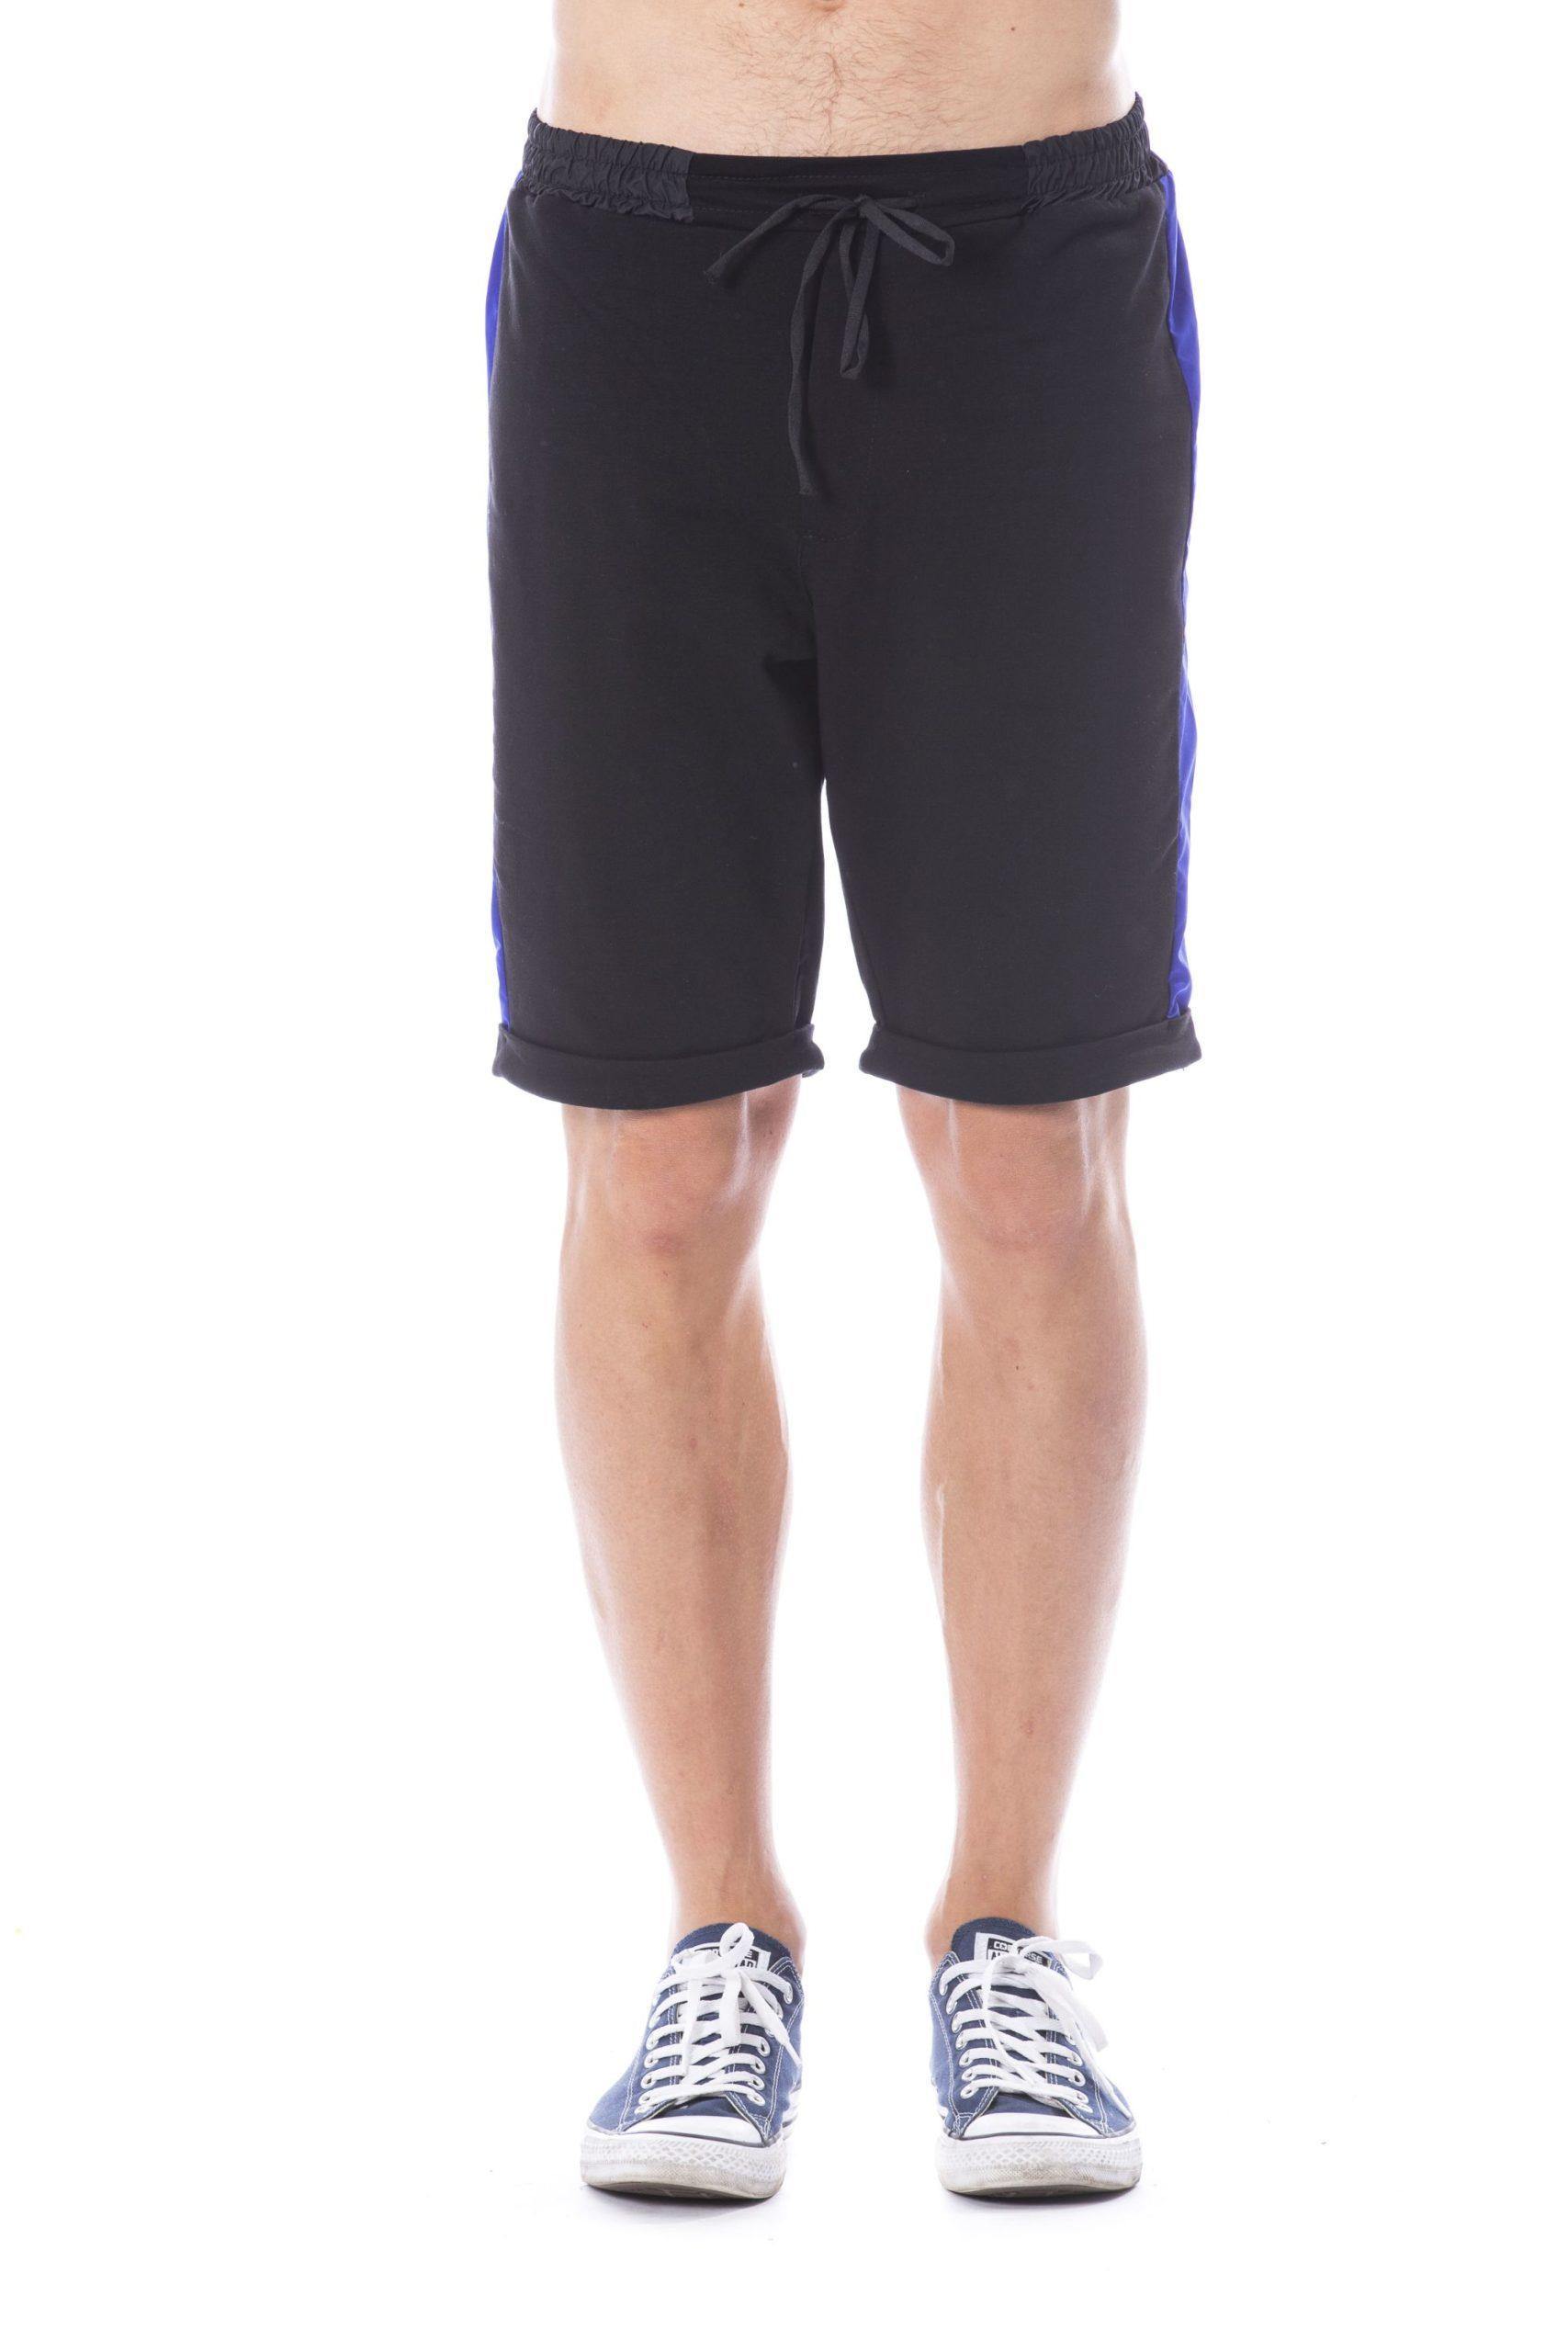 Verri Men's Short Black VE1263257 - S